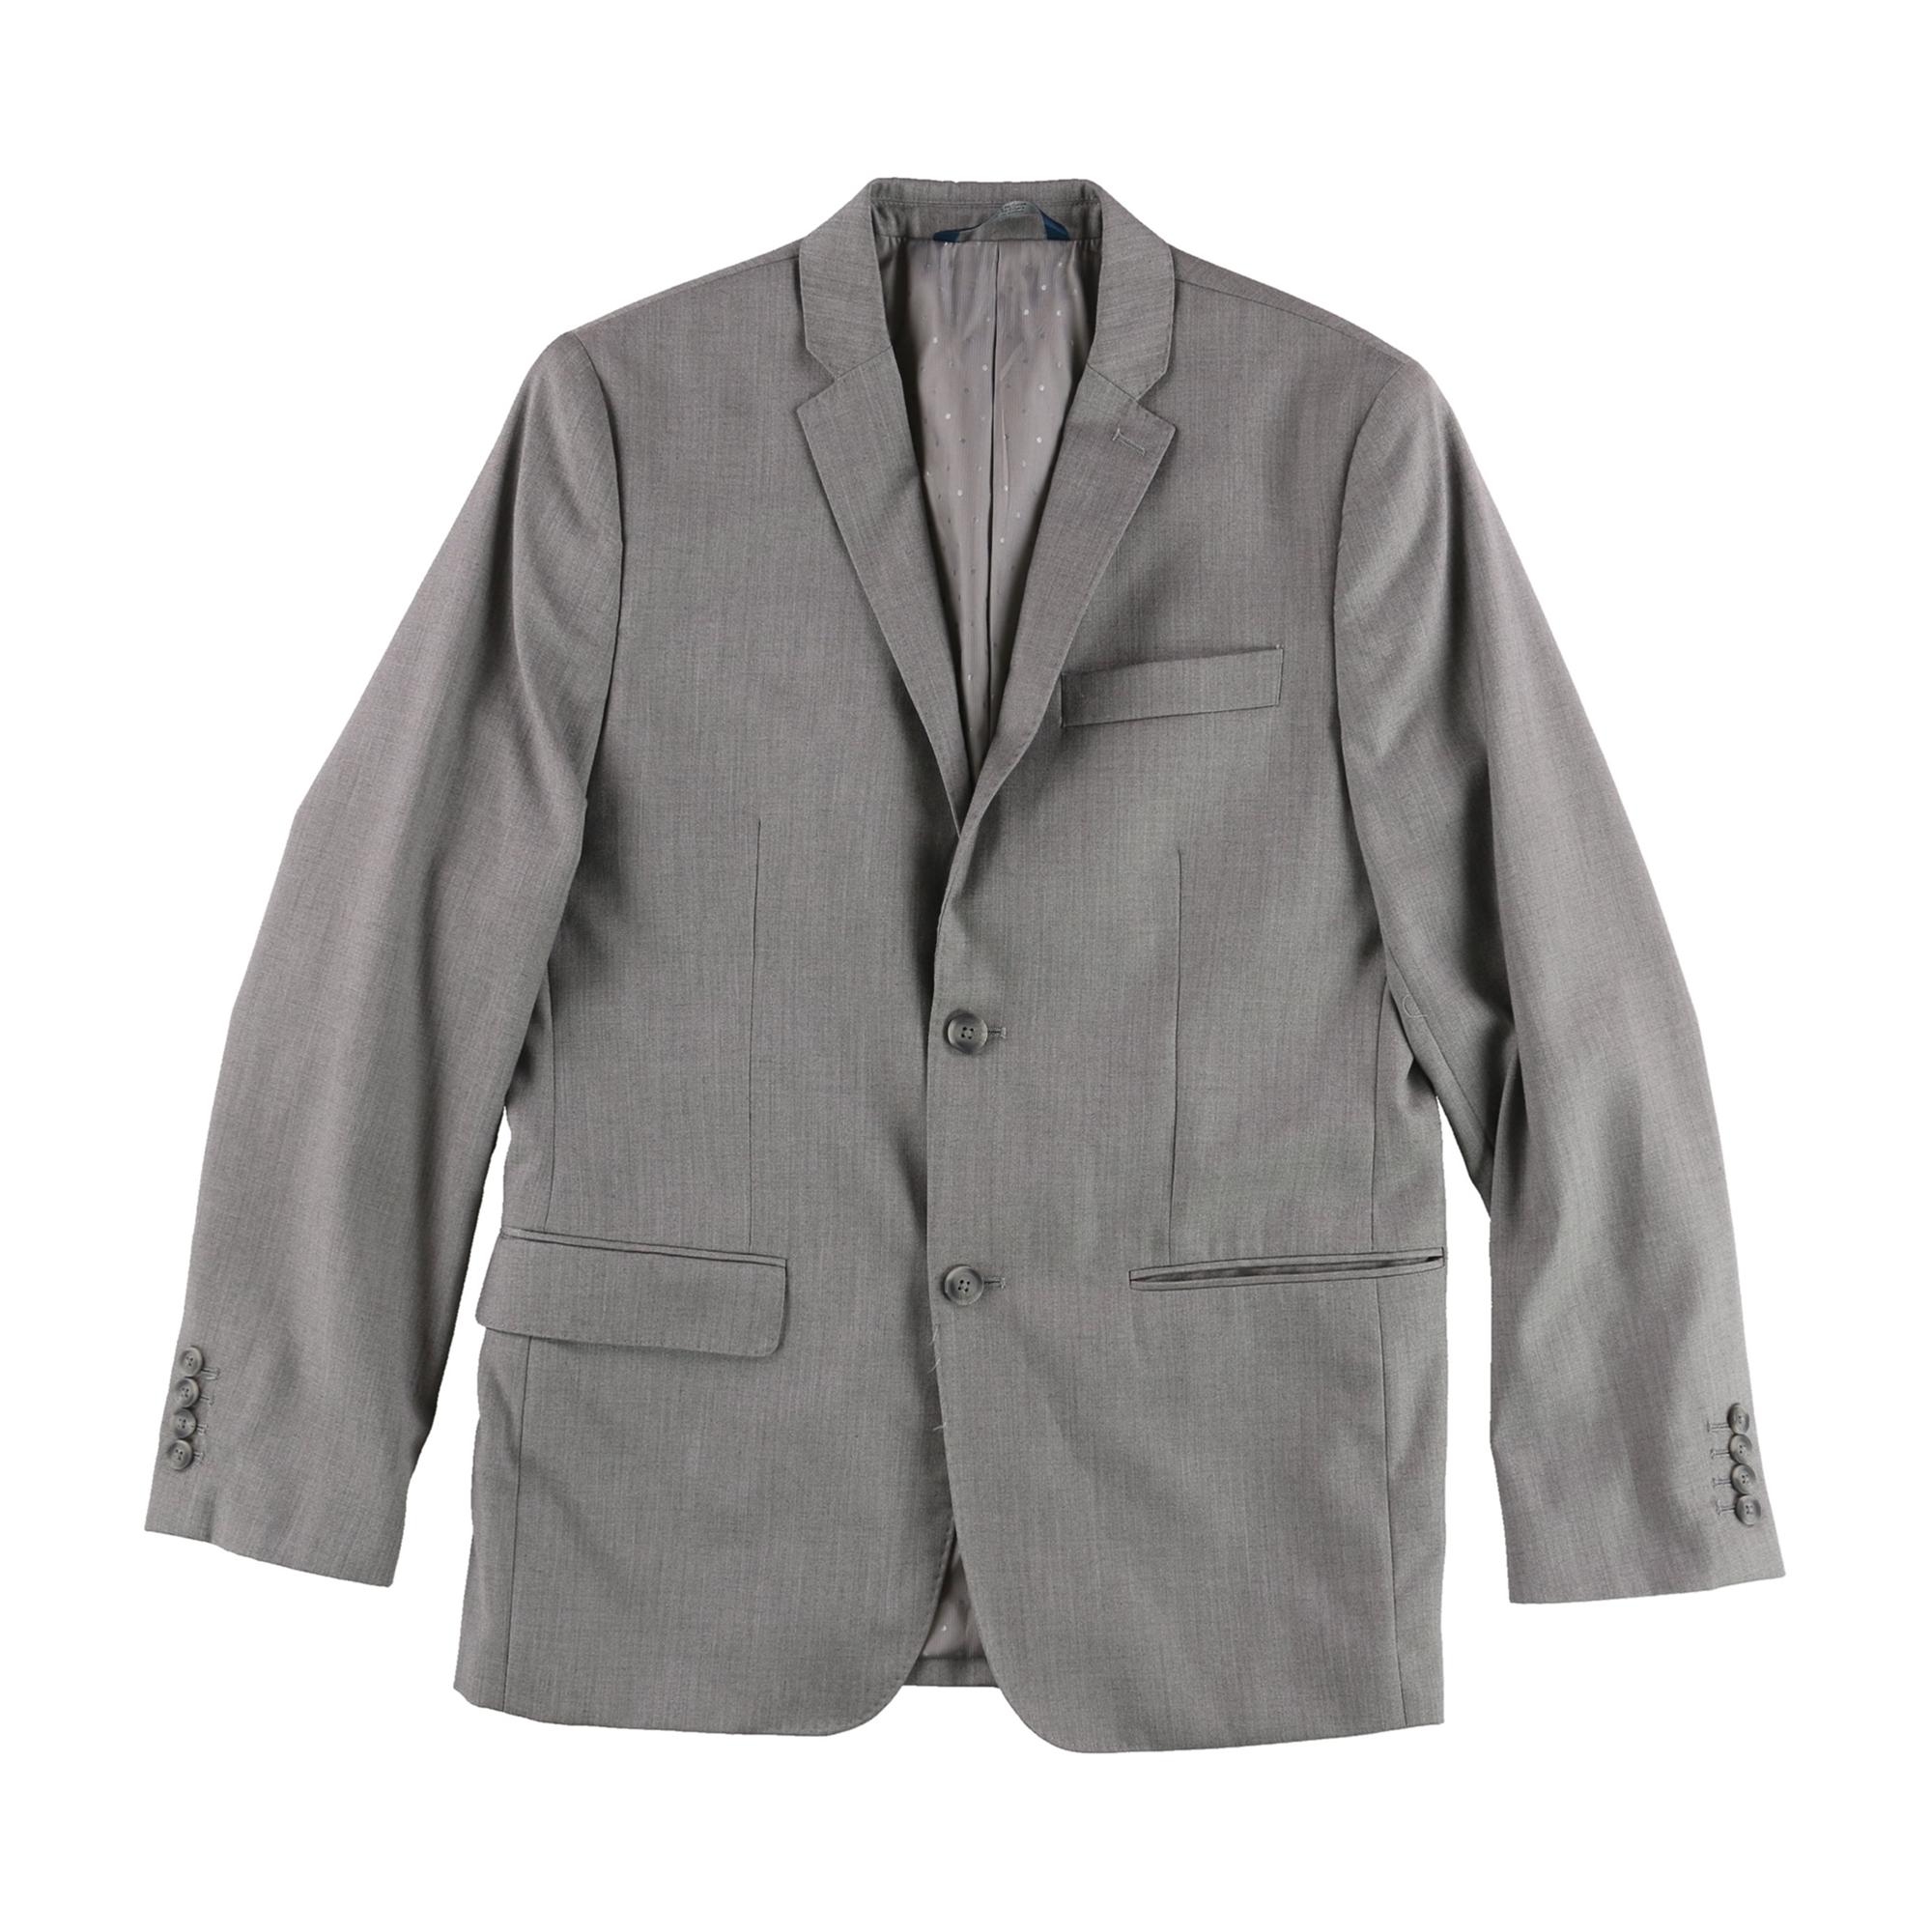 Perry Ellis Mens Professional Two Button Blazer Jacket